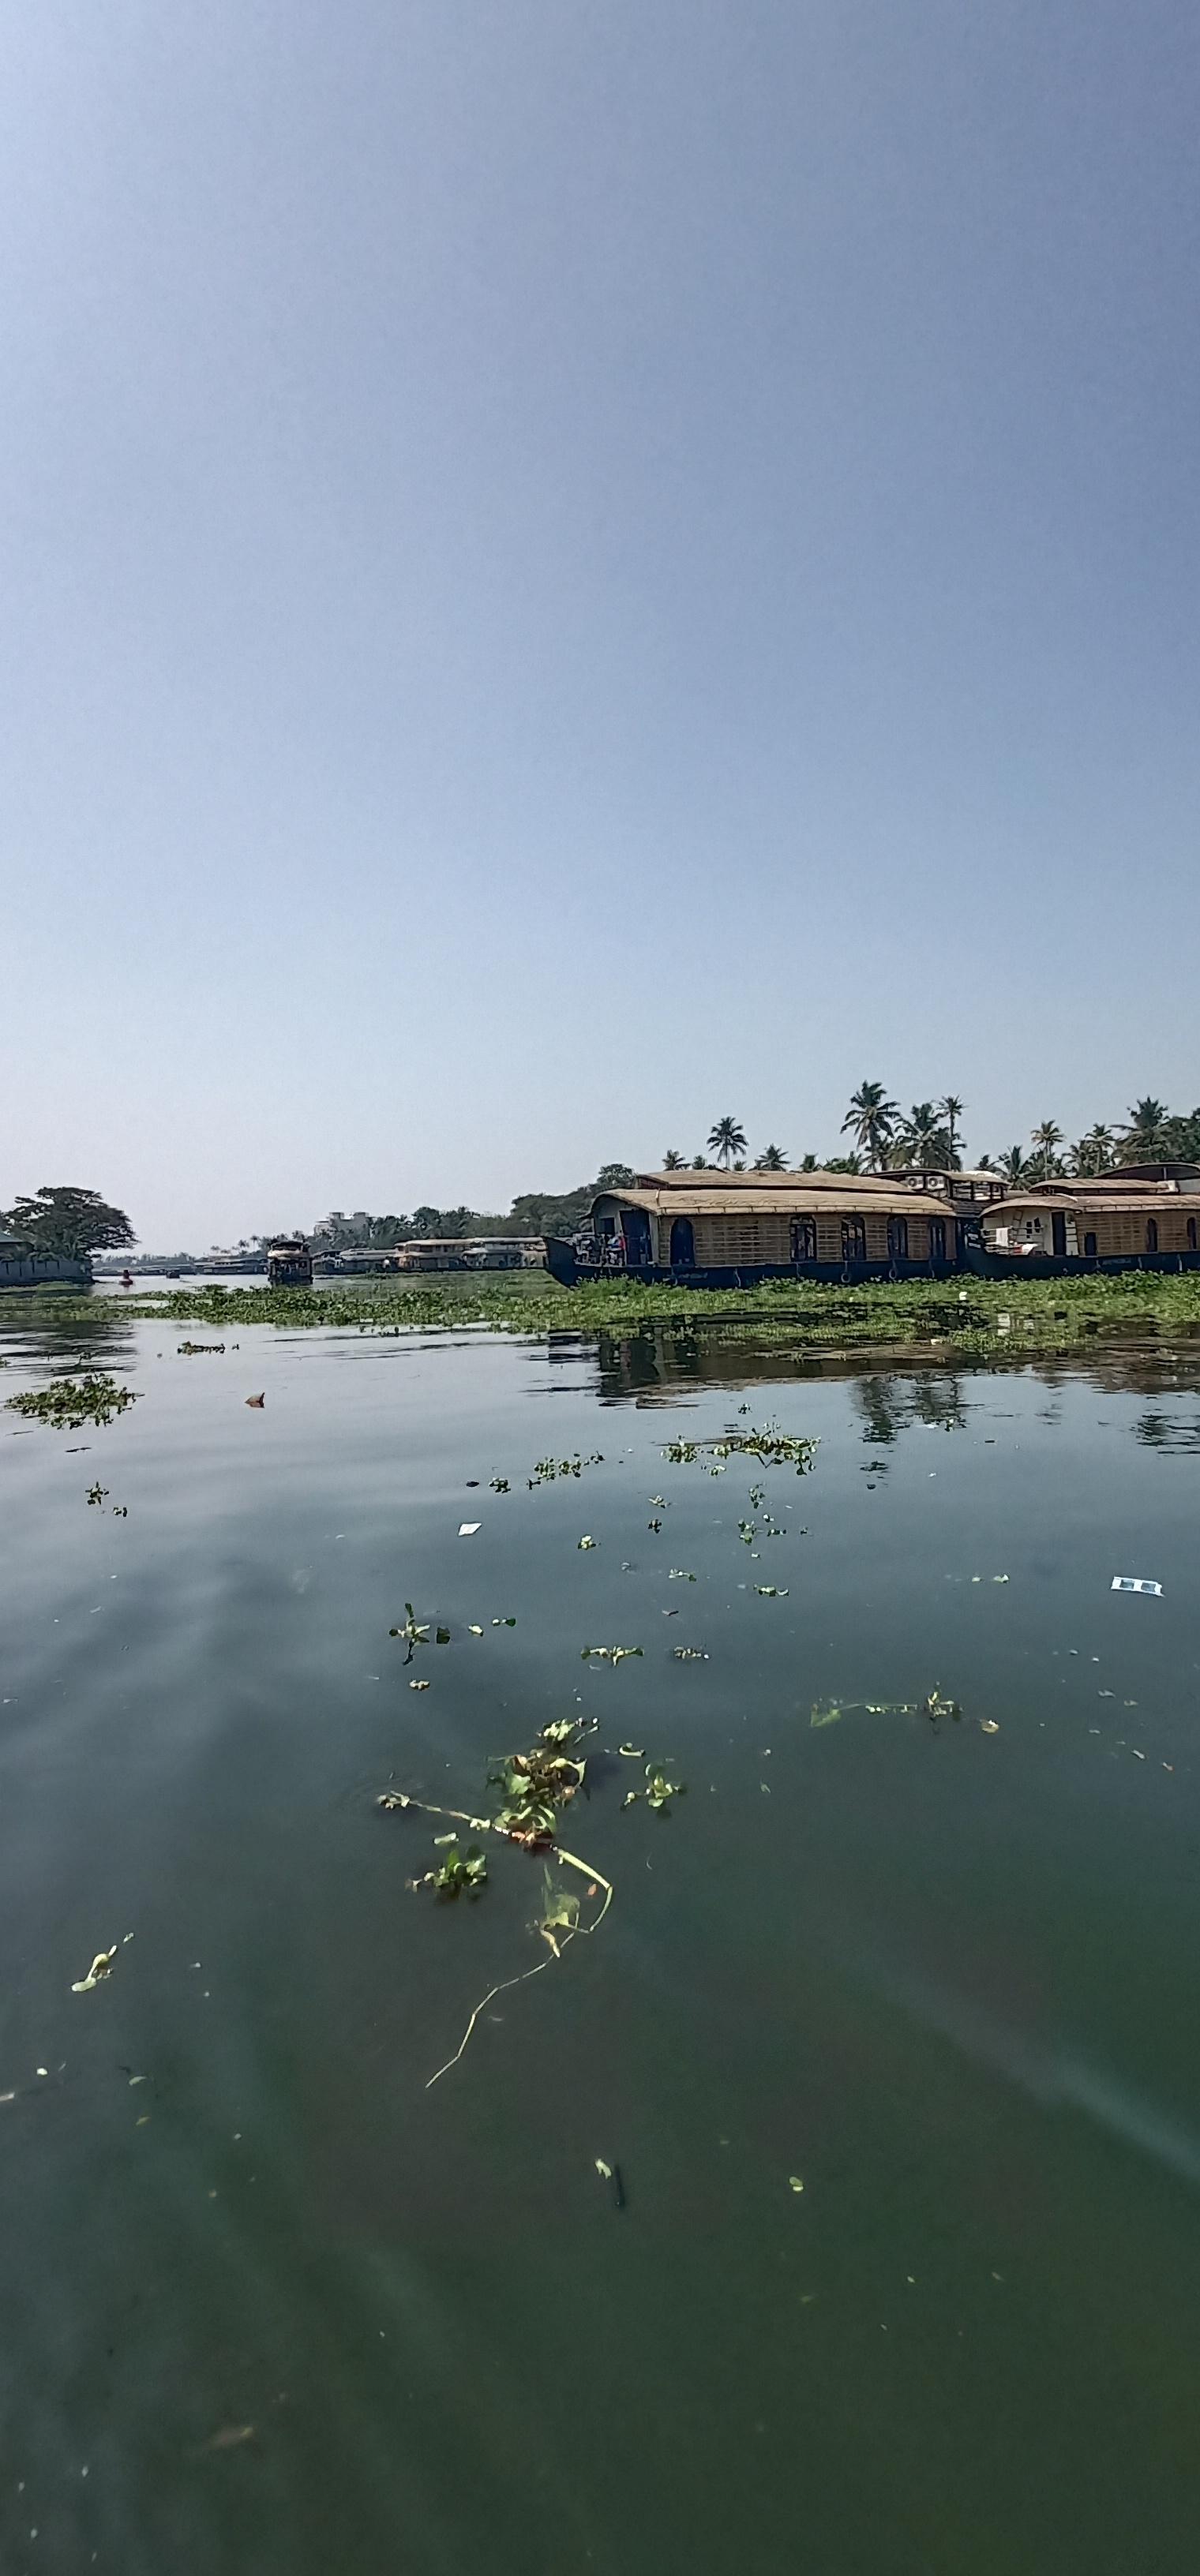 Alleppy_Backwaters_Kerala_houseboat_lake